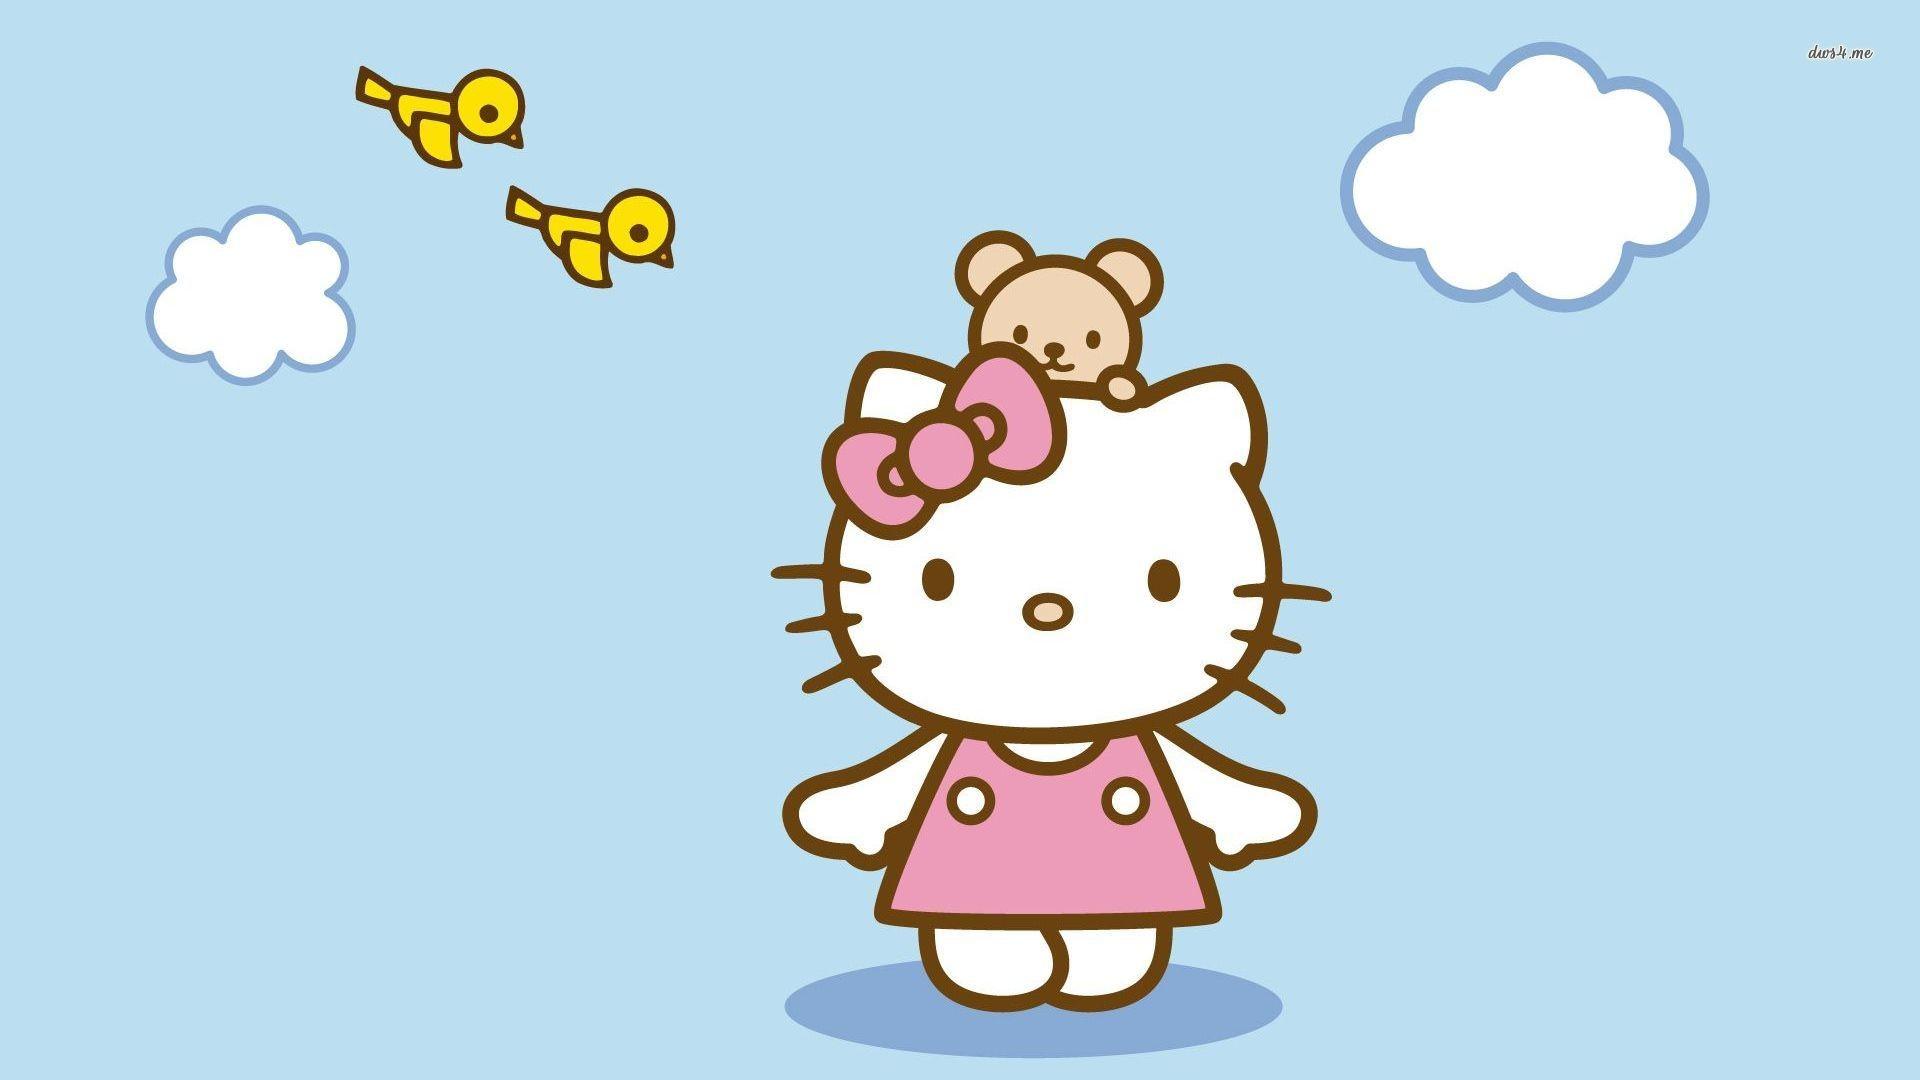 HD Hello Kitty Wallpapers 1